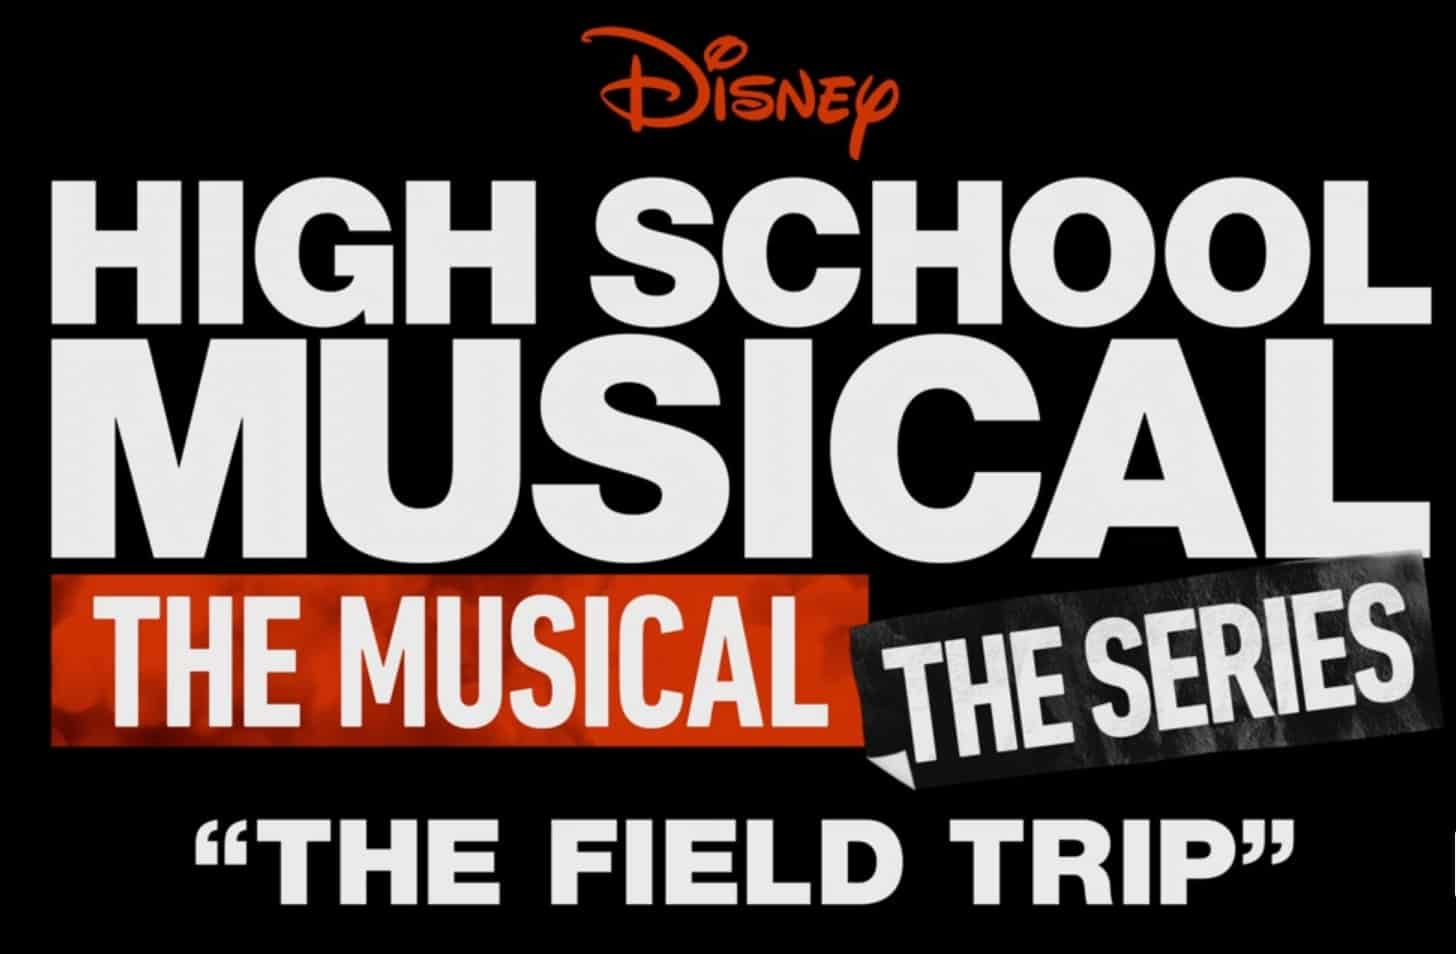 Title Card - High School Musical The Musical The Series Season 2 Episode 7